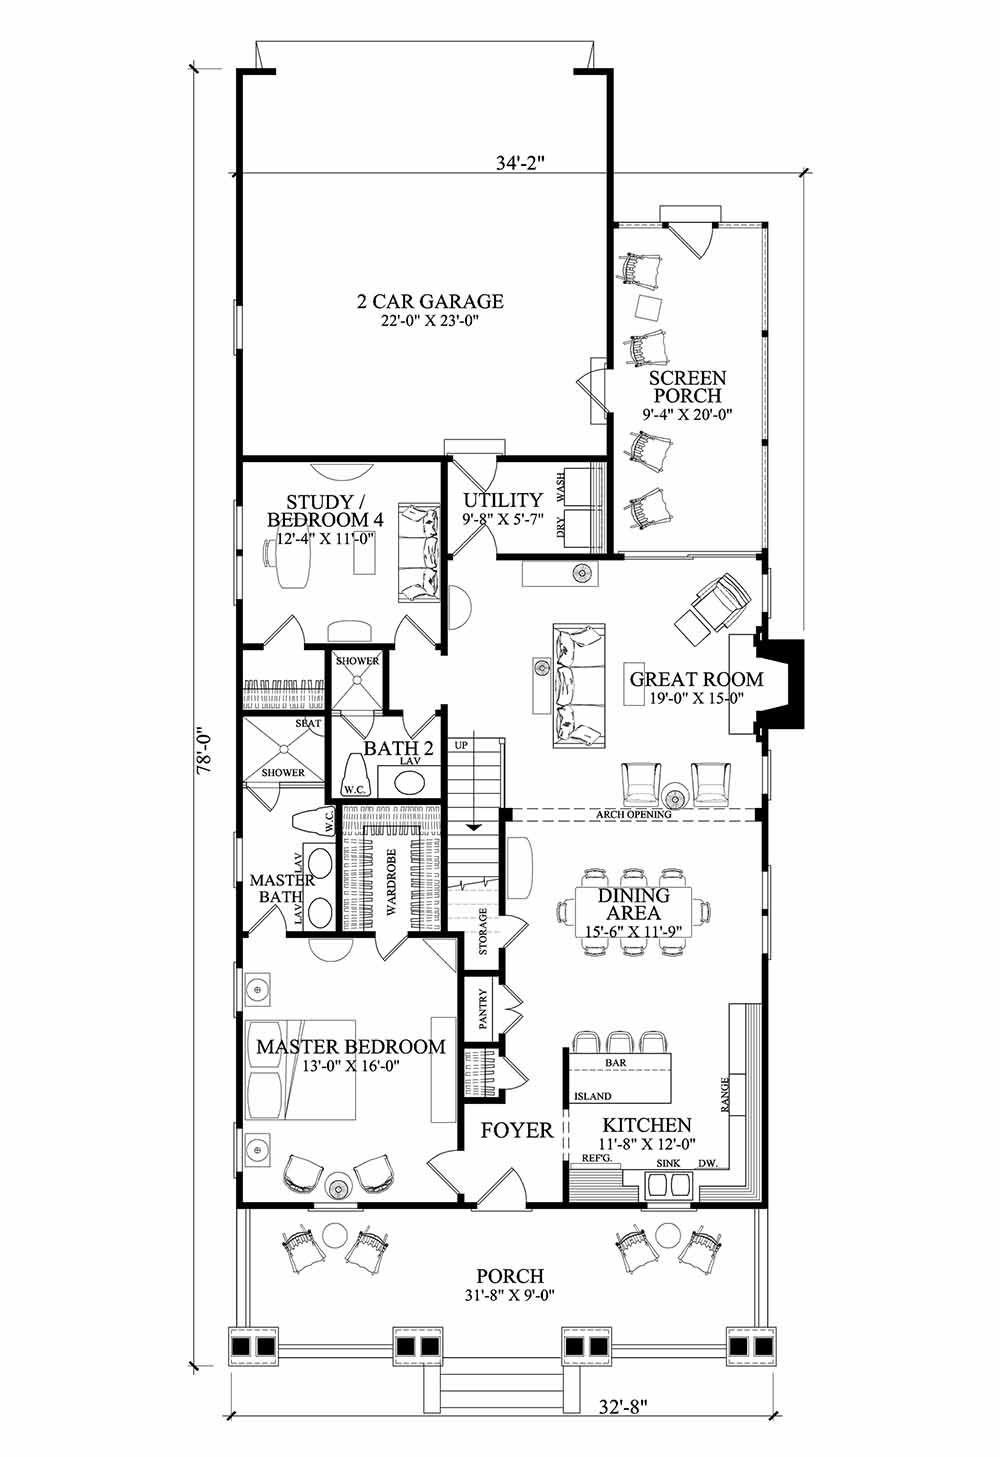 Craftsman Style House Plan - 4 Beds 3 Baths 1928 Sq/Ft Plan #137-284 ...